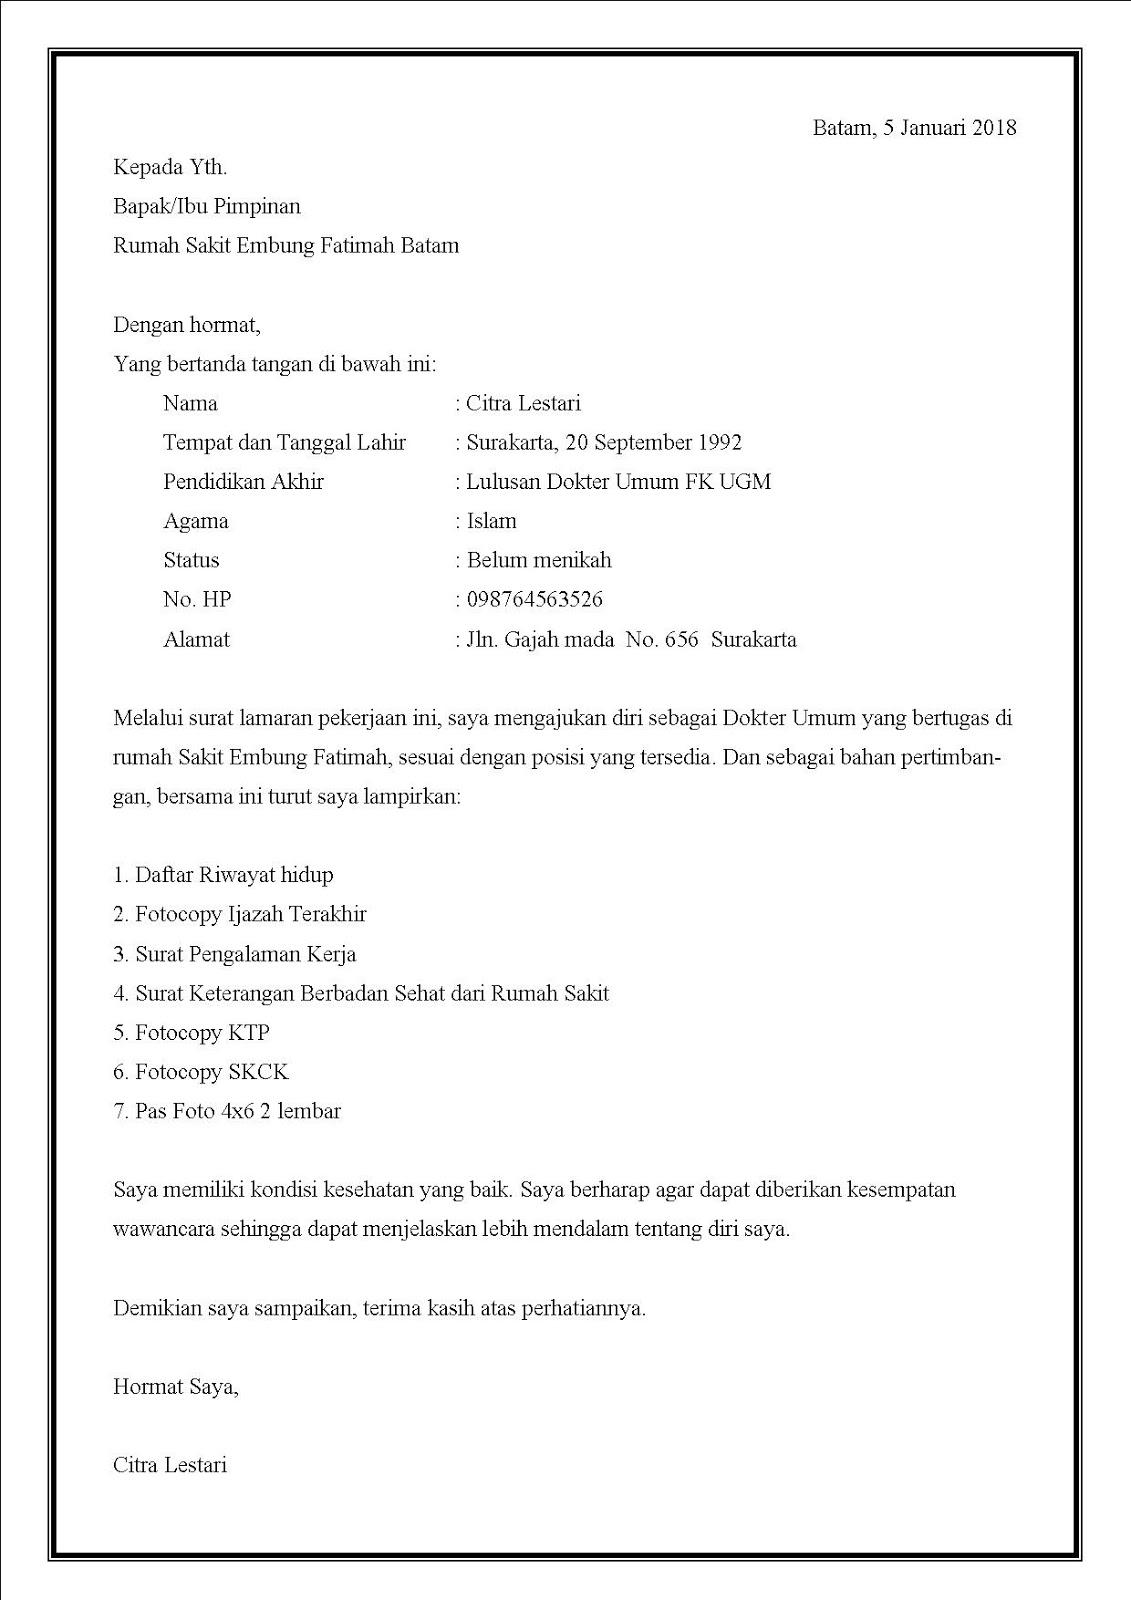 Contoh surat lamaran kerja di rumah sakit Terbaru